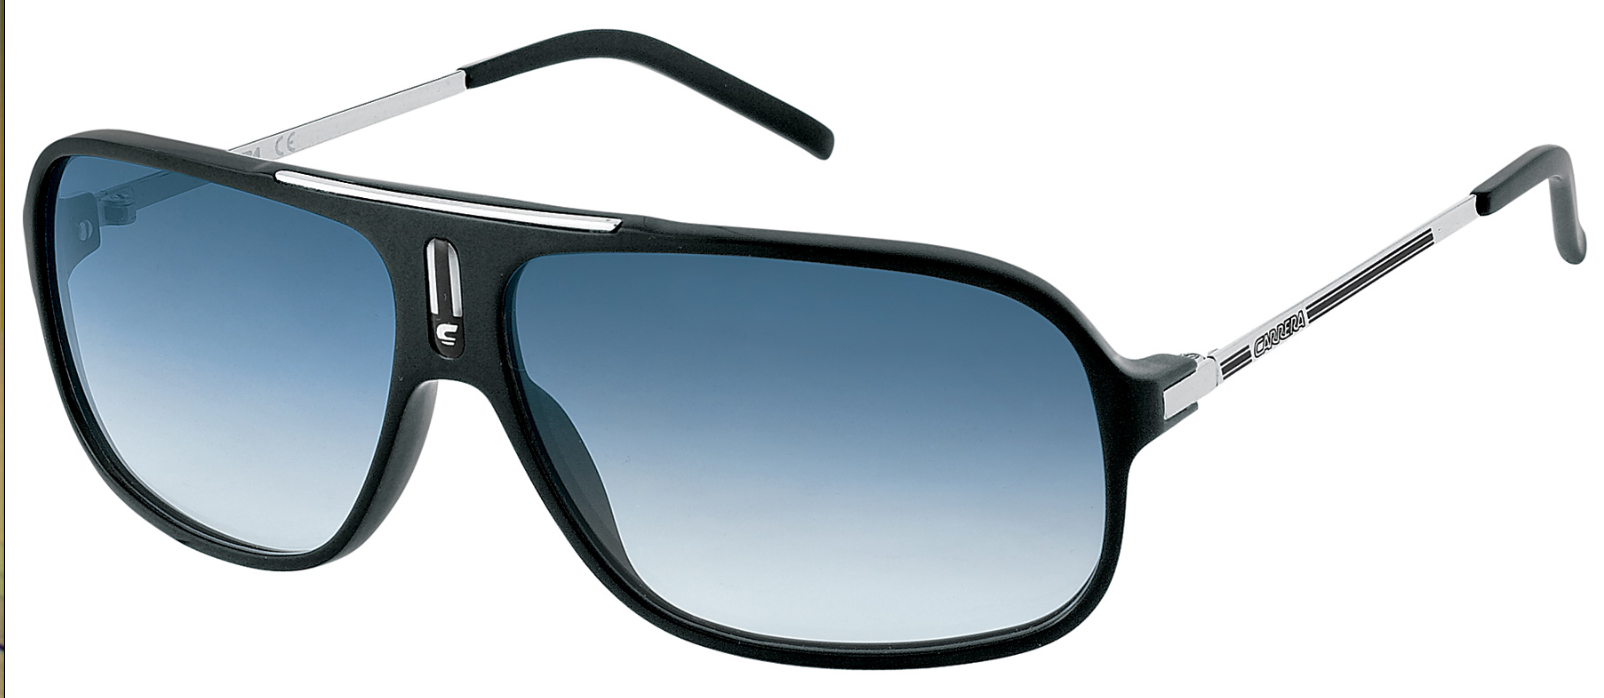 8c166a94eaa Carrera Cool Sunglasses